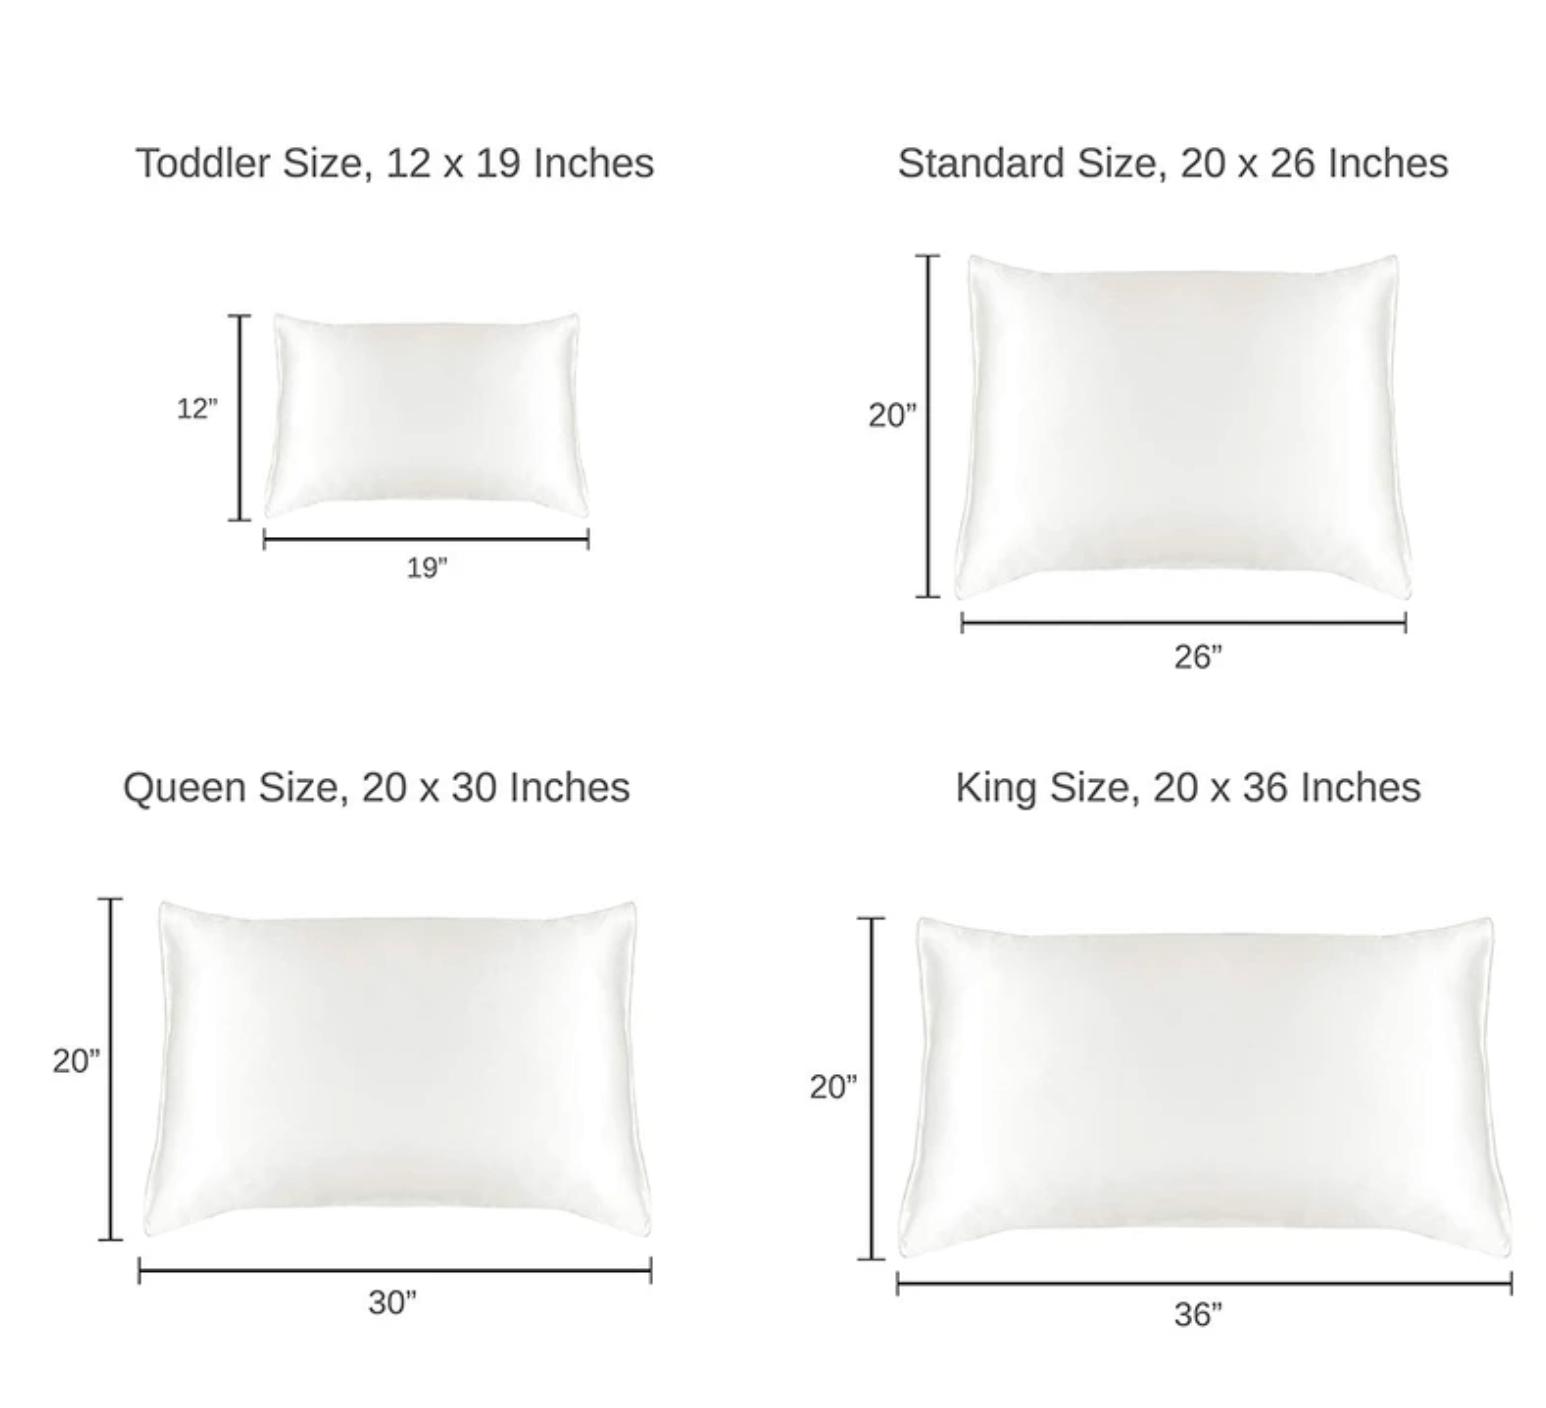 Standard Toddler Pillow Size